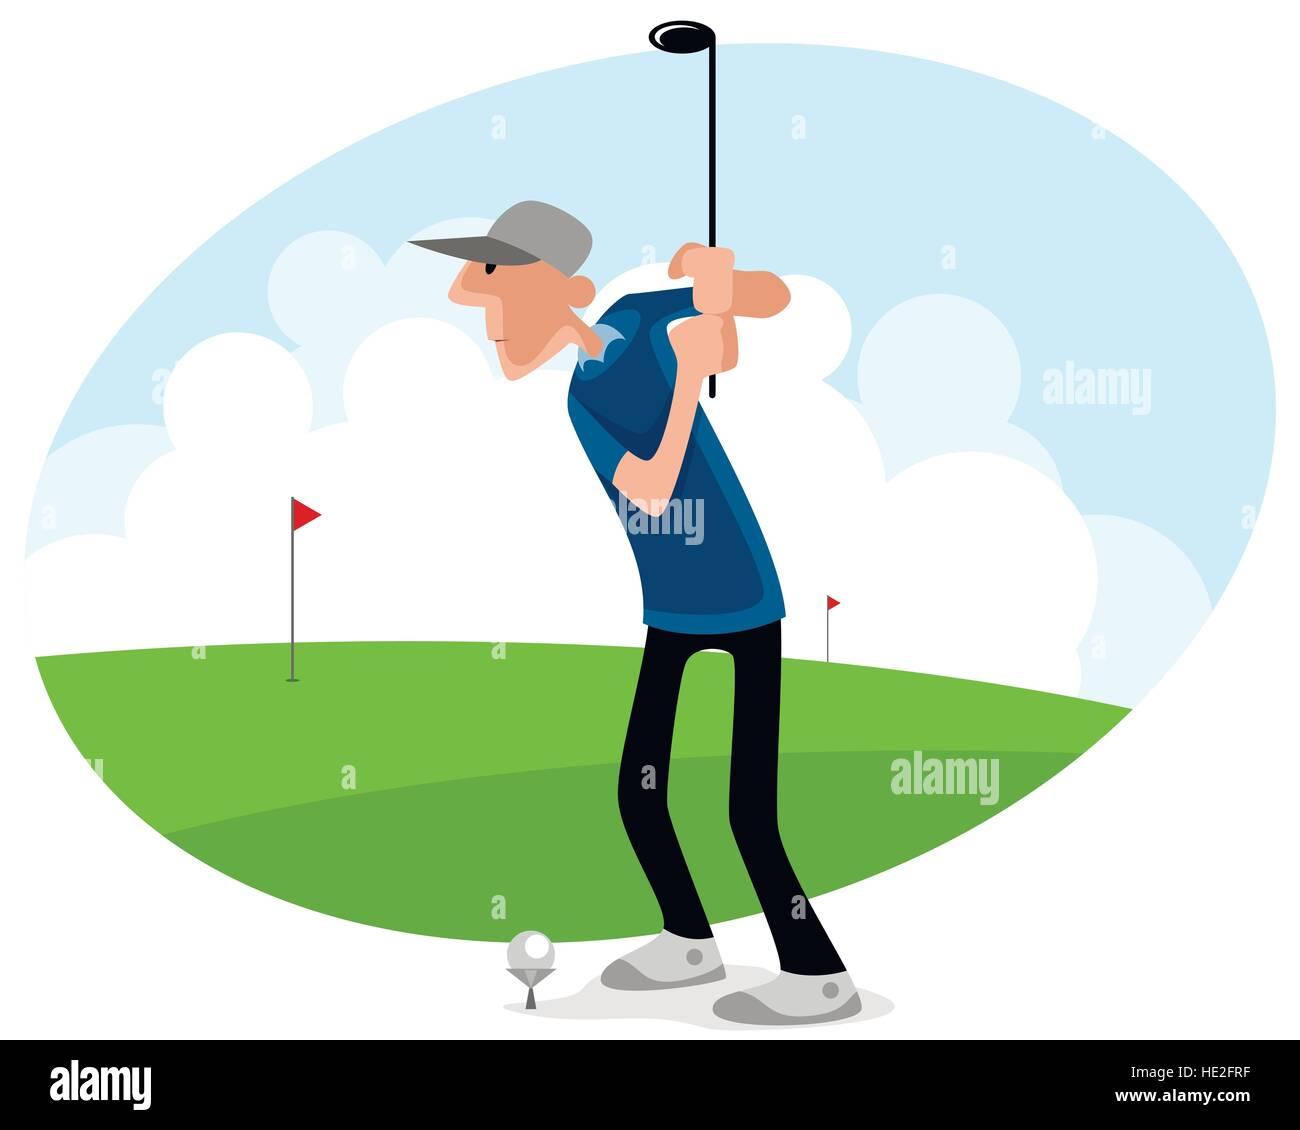 Golf Cartoon Stock Photos & Golf Cartoon Stock Images - Alamy on cartoon easy draw golf club, easy drawings to draw golf club, cartoon golf club bag, cartoon swinging golf club,